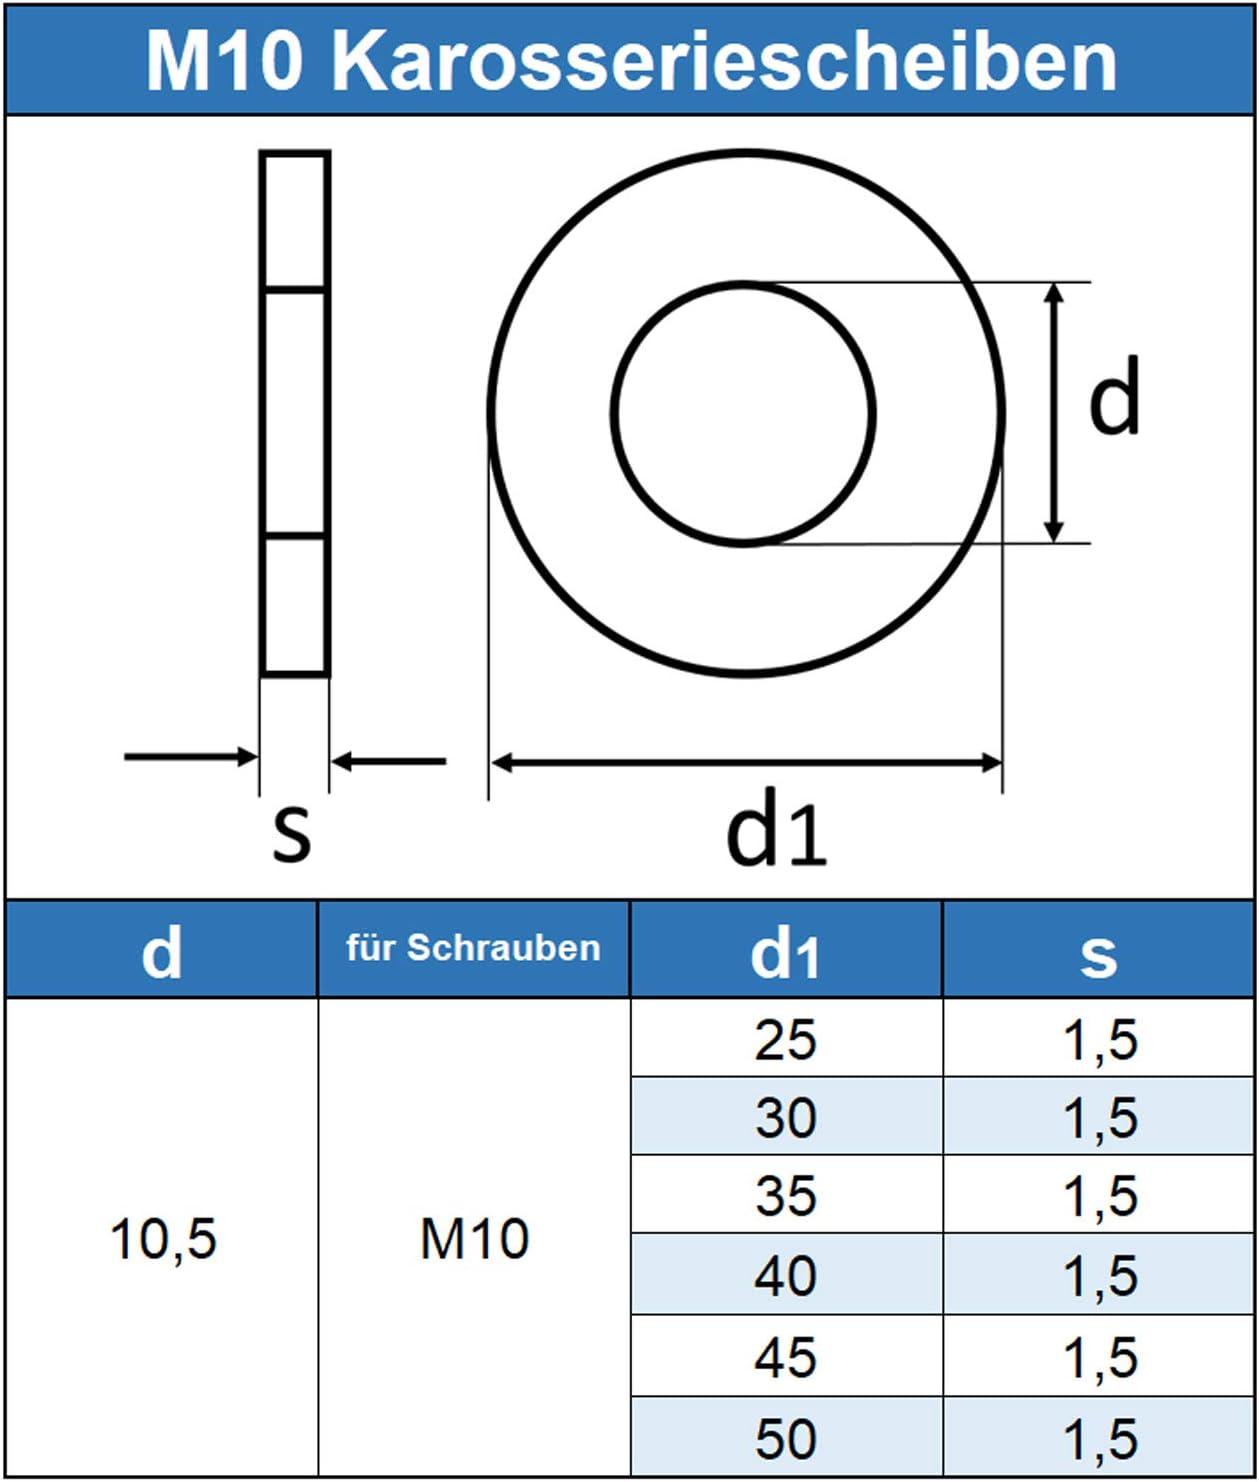 M10 Karosseriescheiben 10,5 X 50 mm Kotfl/ügelscheiben Edelstahl A2 V2A - Beilagscheiben Eisenwaren2000 rostfrei 10 St/ück